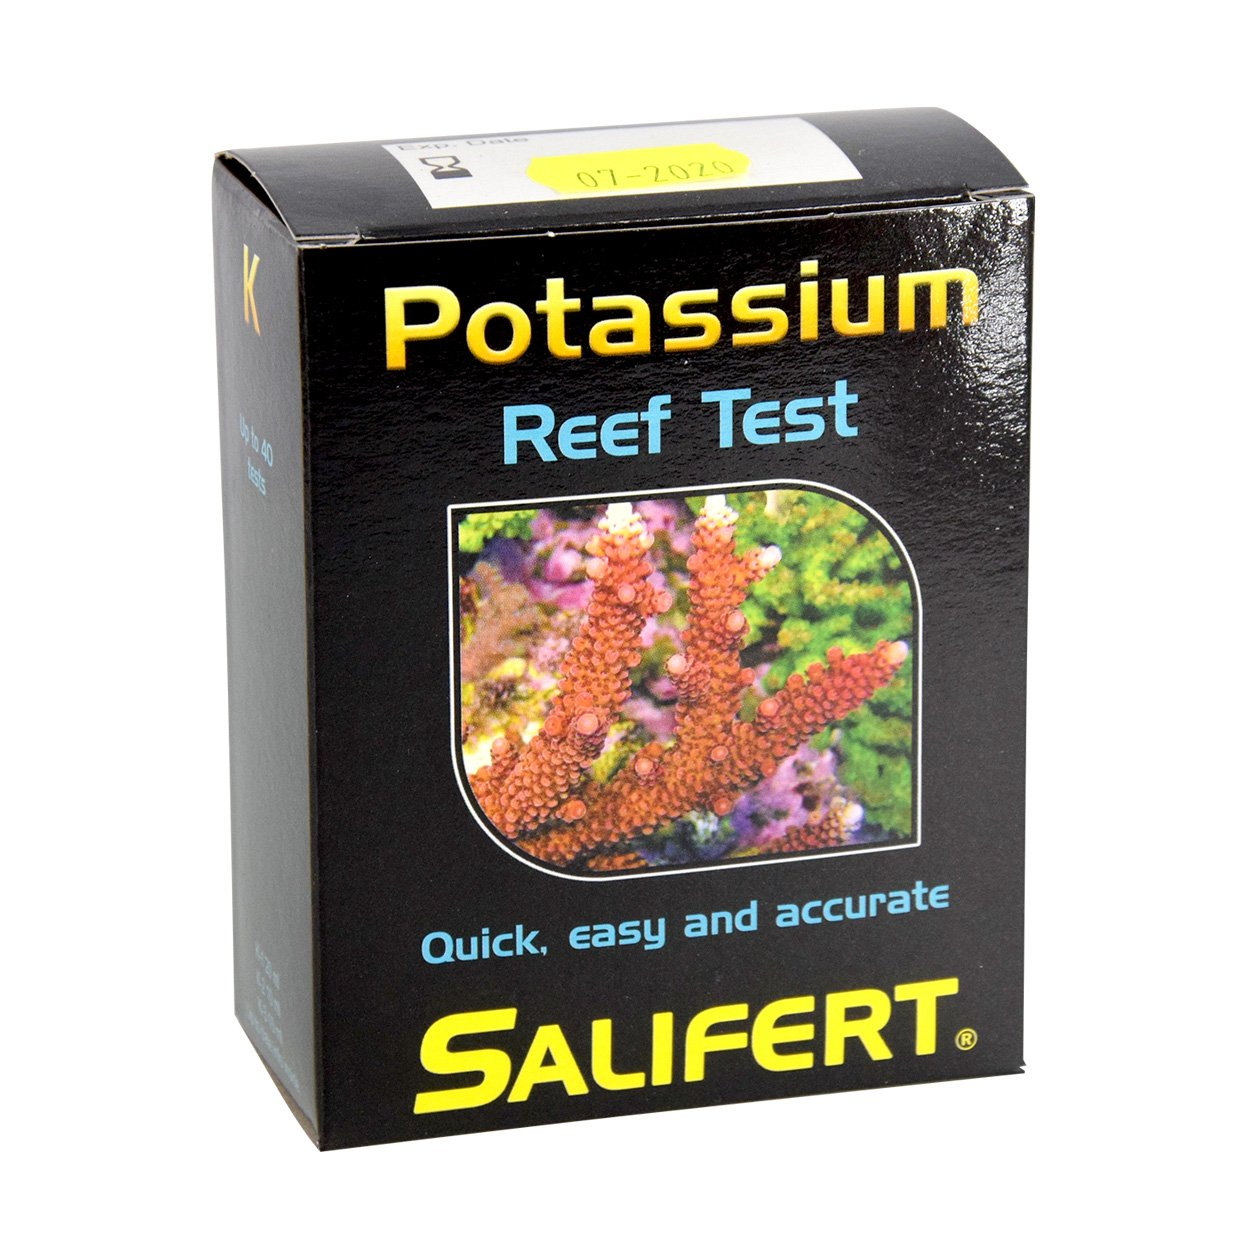 Salifert RTKA Potassium Test Kit by Salifert